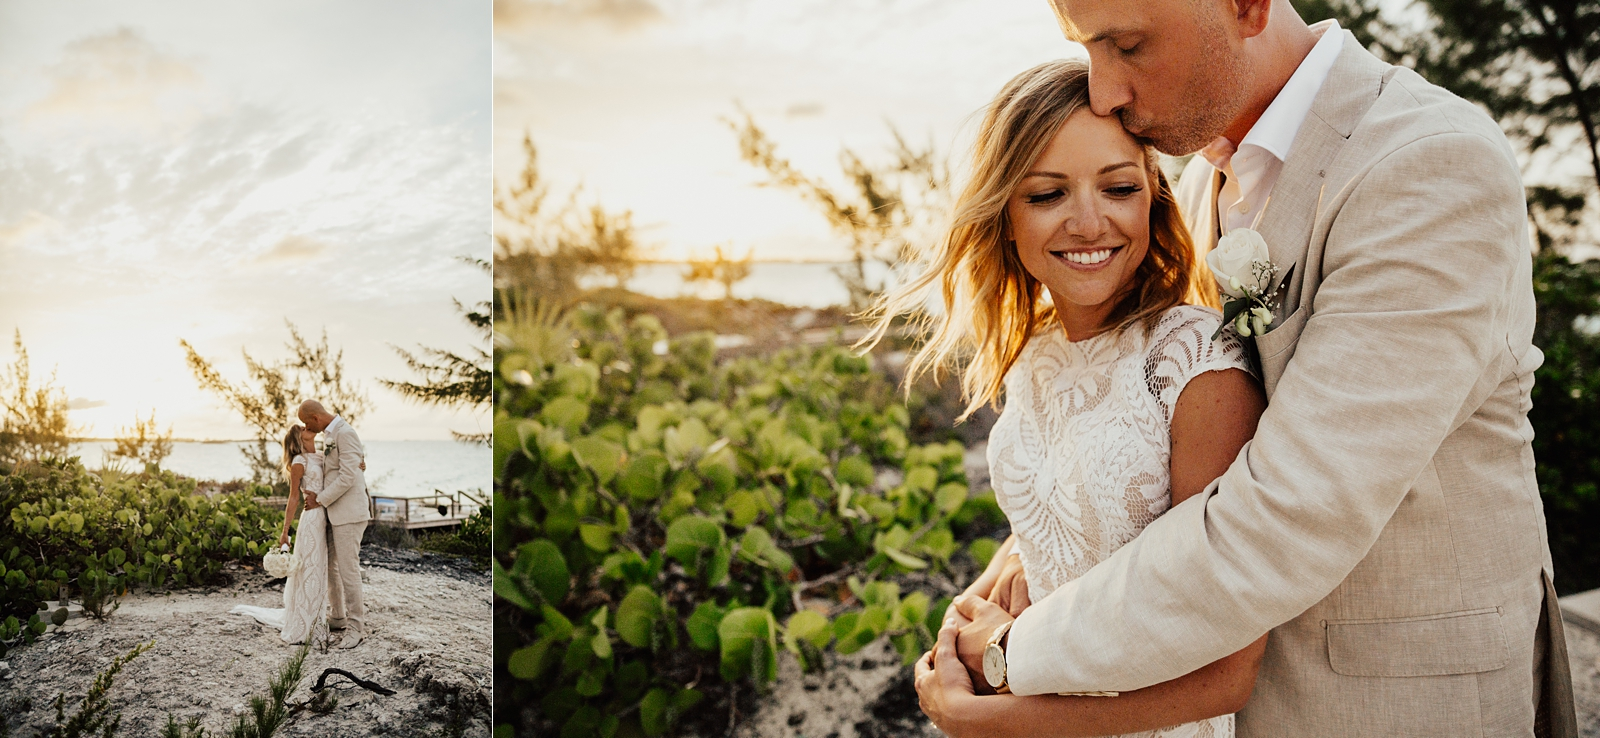 Jenni & Andrew Intimate Beach Destination Wedding in Little Exuma, Bahamas_0523.jpg